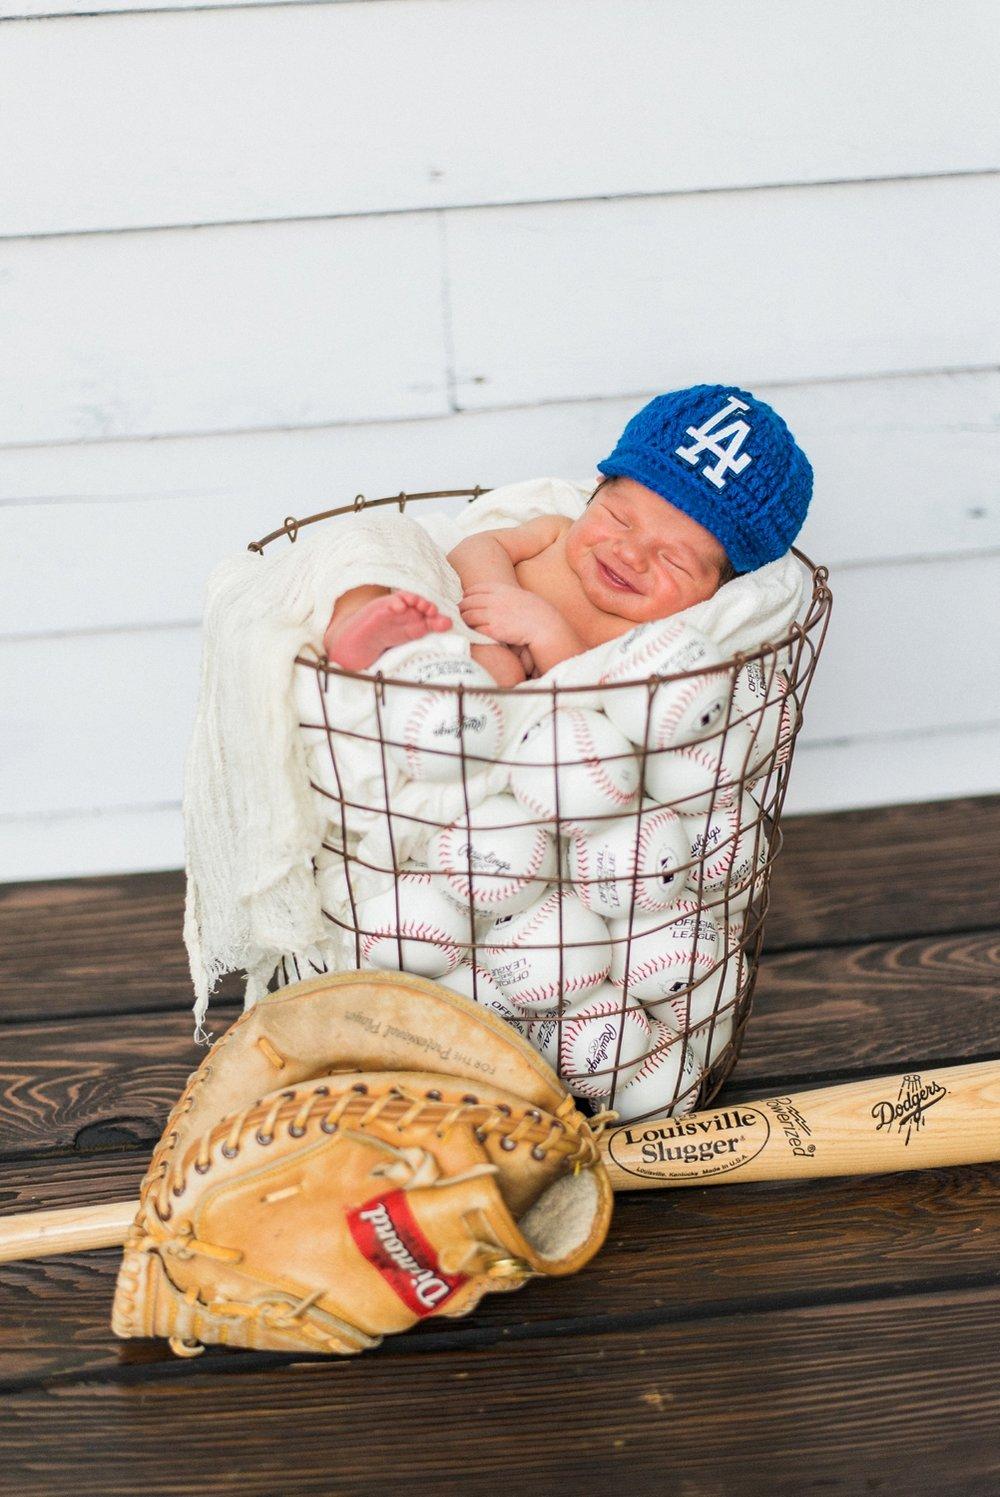 portland-oregon-newborn-photographer-sleeping-baby-boy-bucket-of-baseballs-basket-shelley-marie-photography-146.jpg